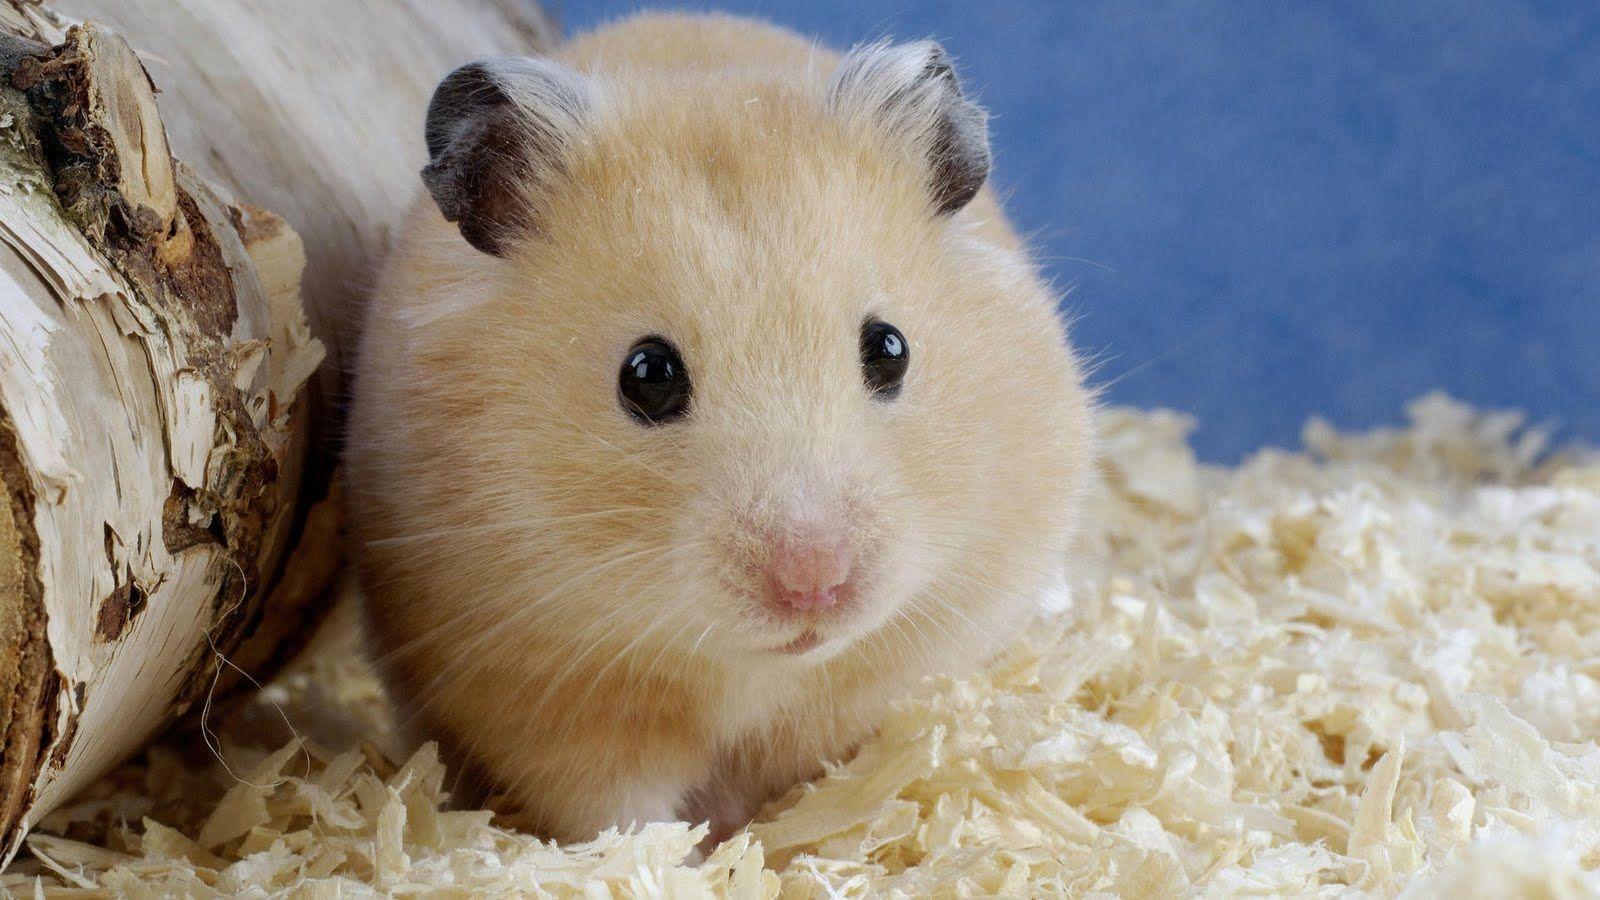 Free Wallpaper Archive 10 Hamster Wallpapers Little